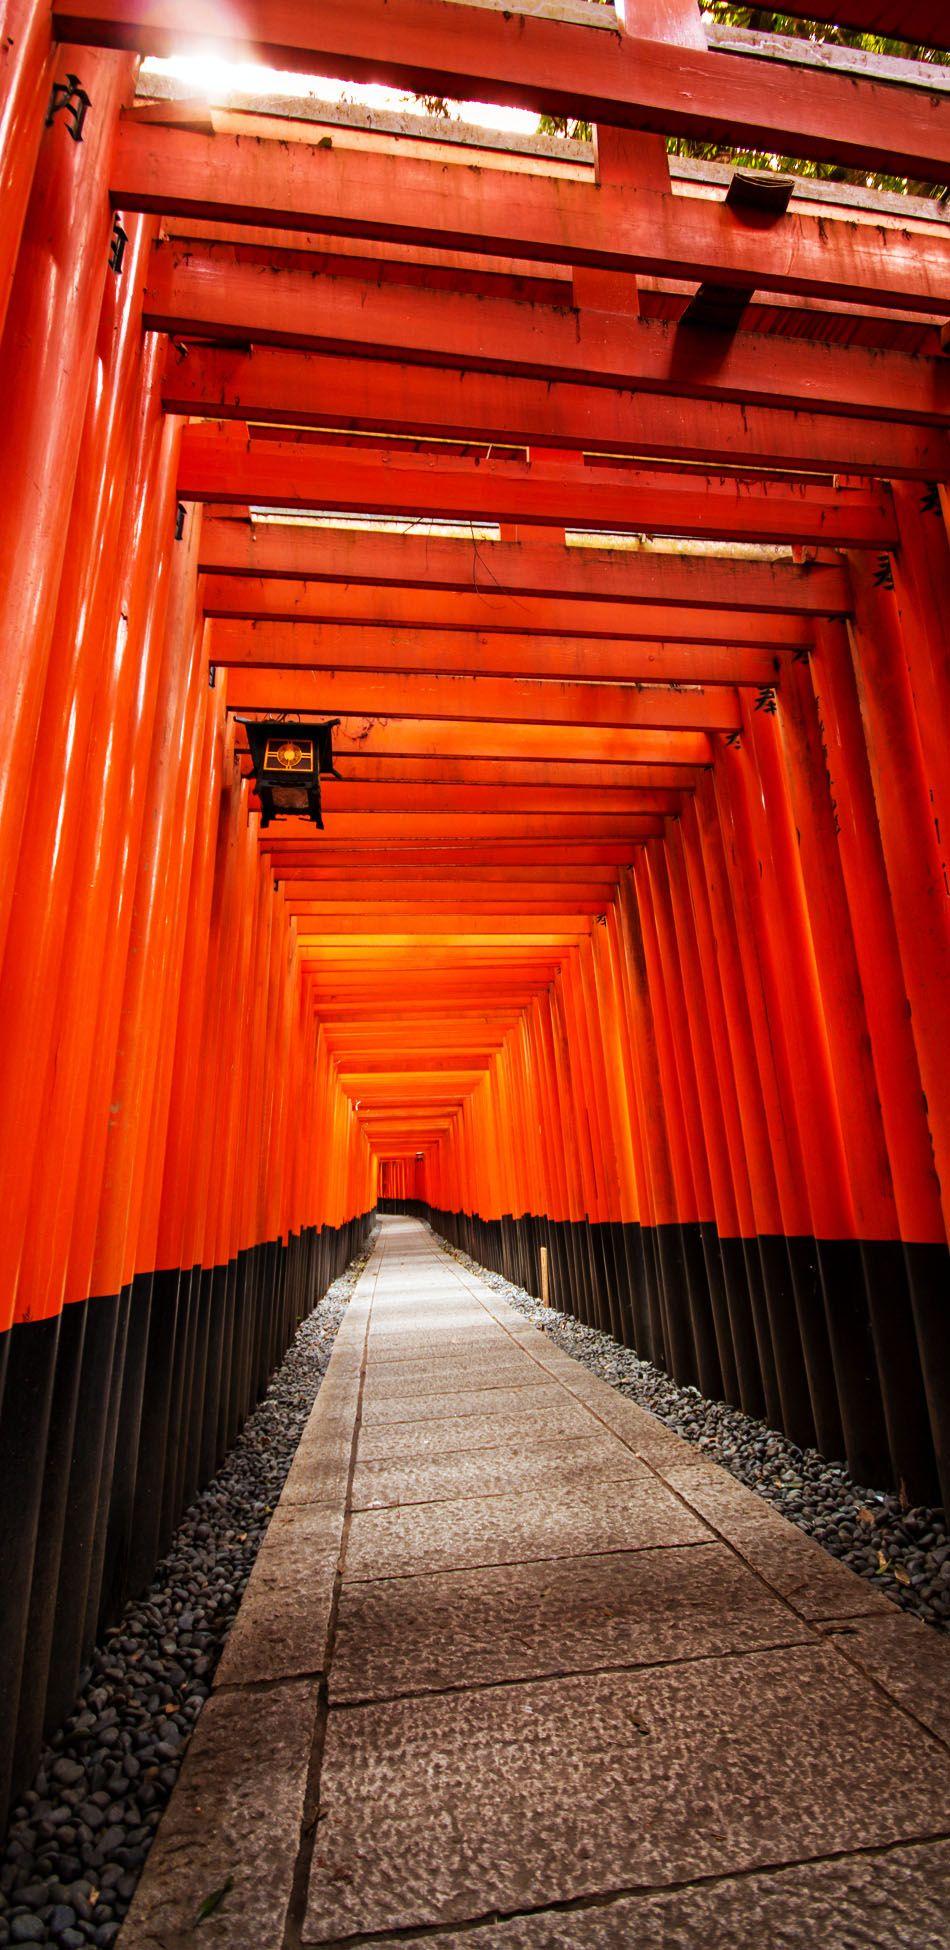 Famous Pathway of 1000 Gates at Fushimiinari Taisha Shrine, Kyoto, Japan | 19 Reasons to Love Japan, an Unforgettable Travel Destination